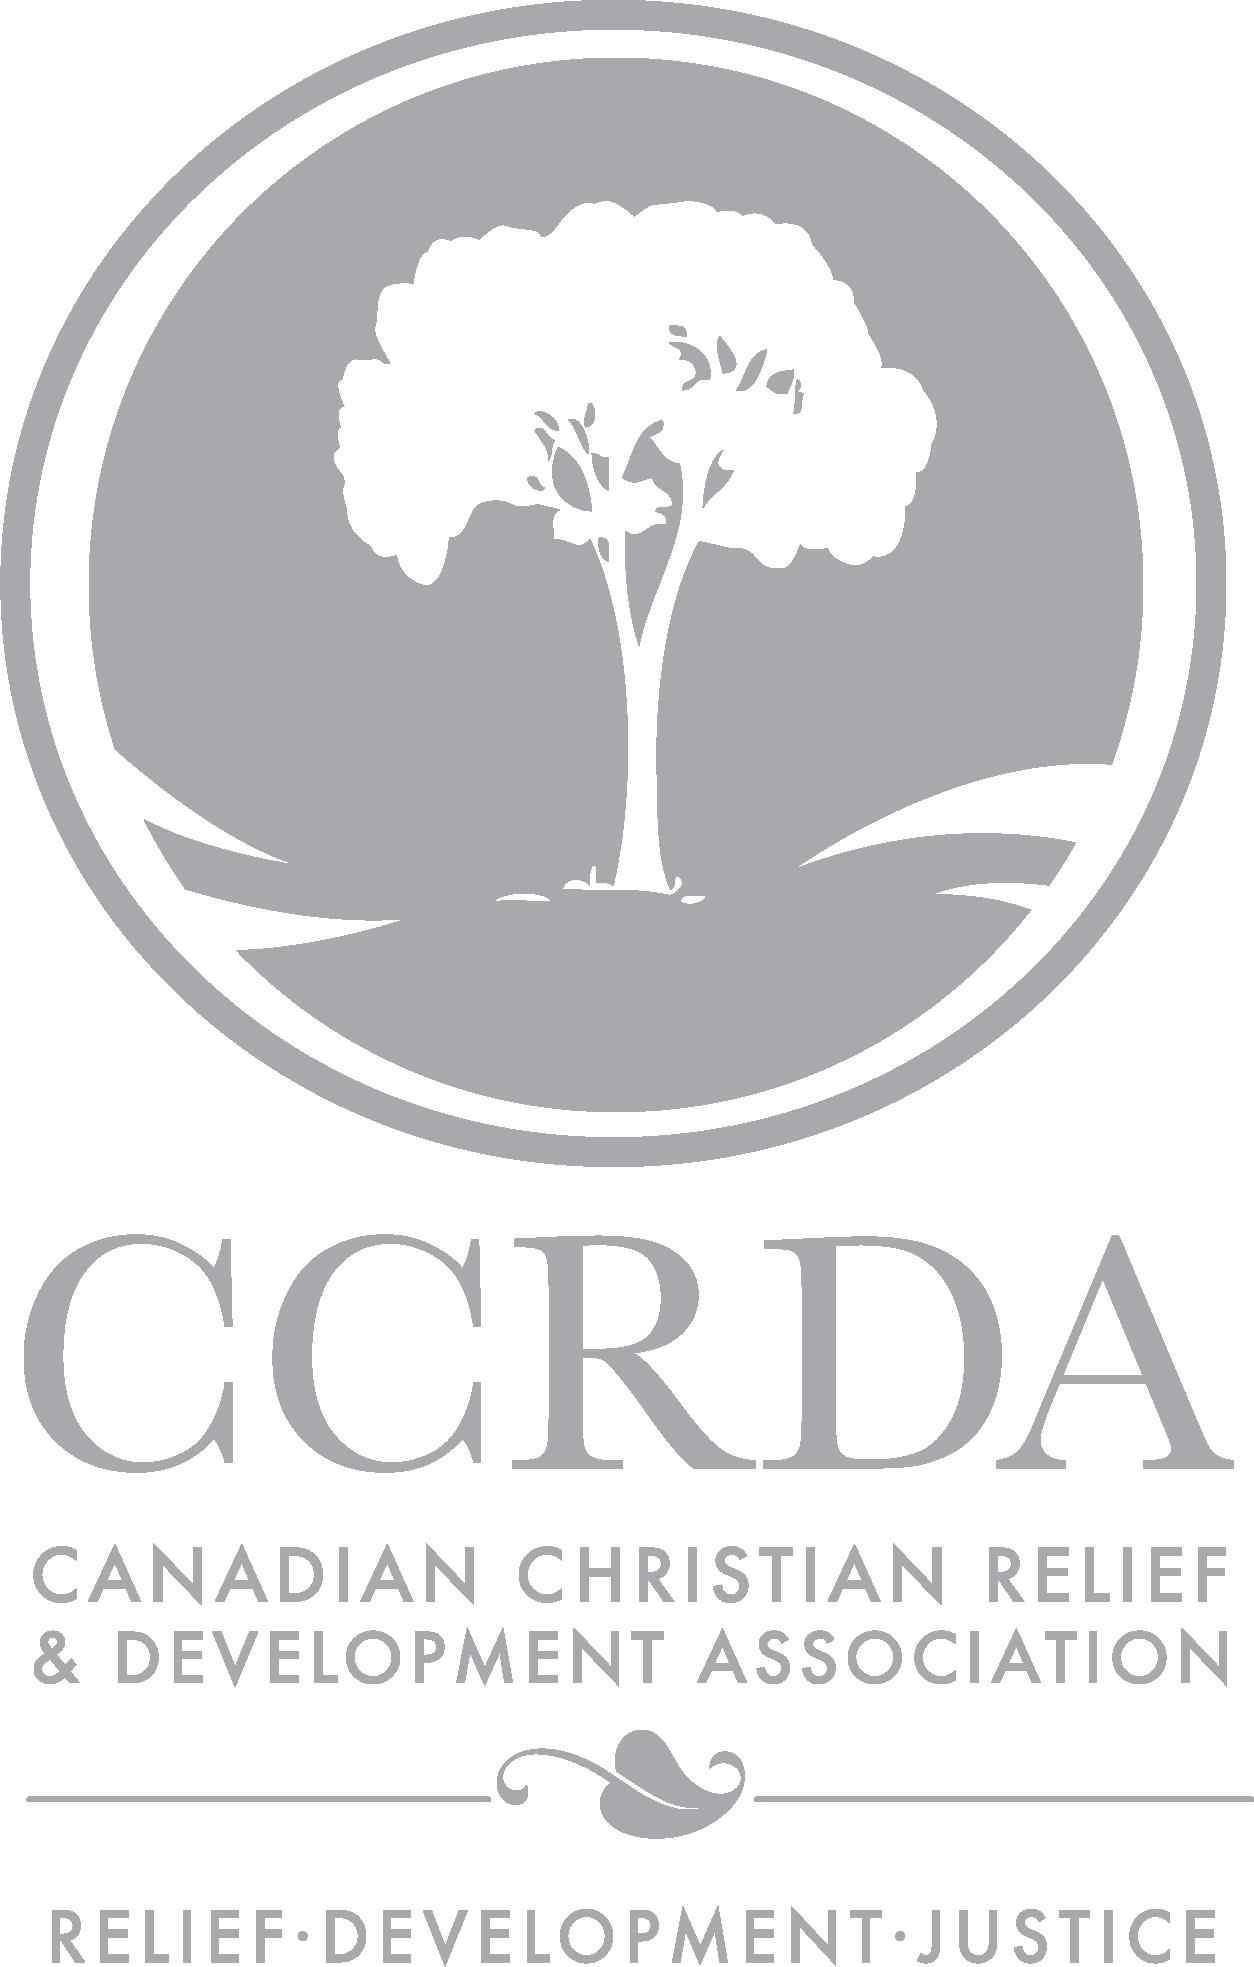 CCRDA